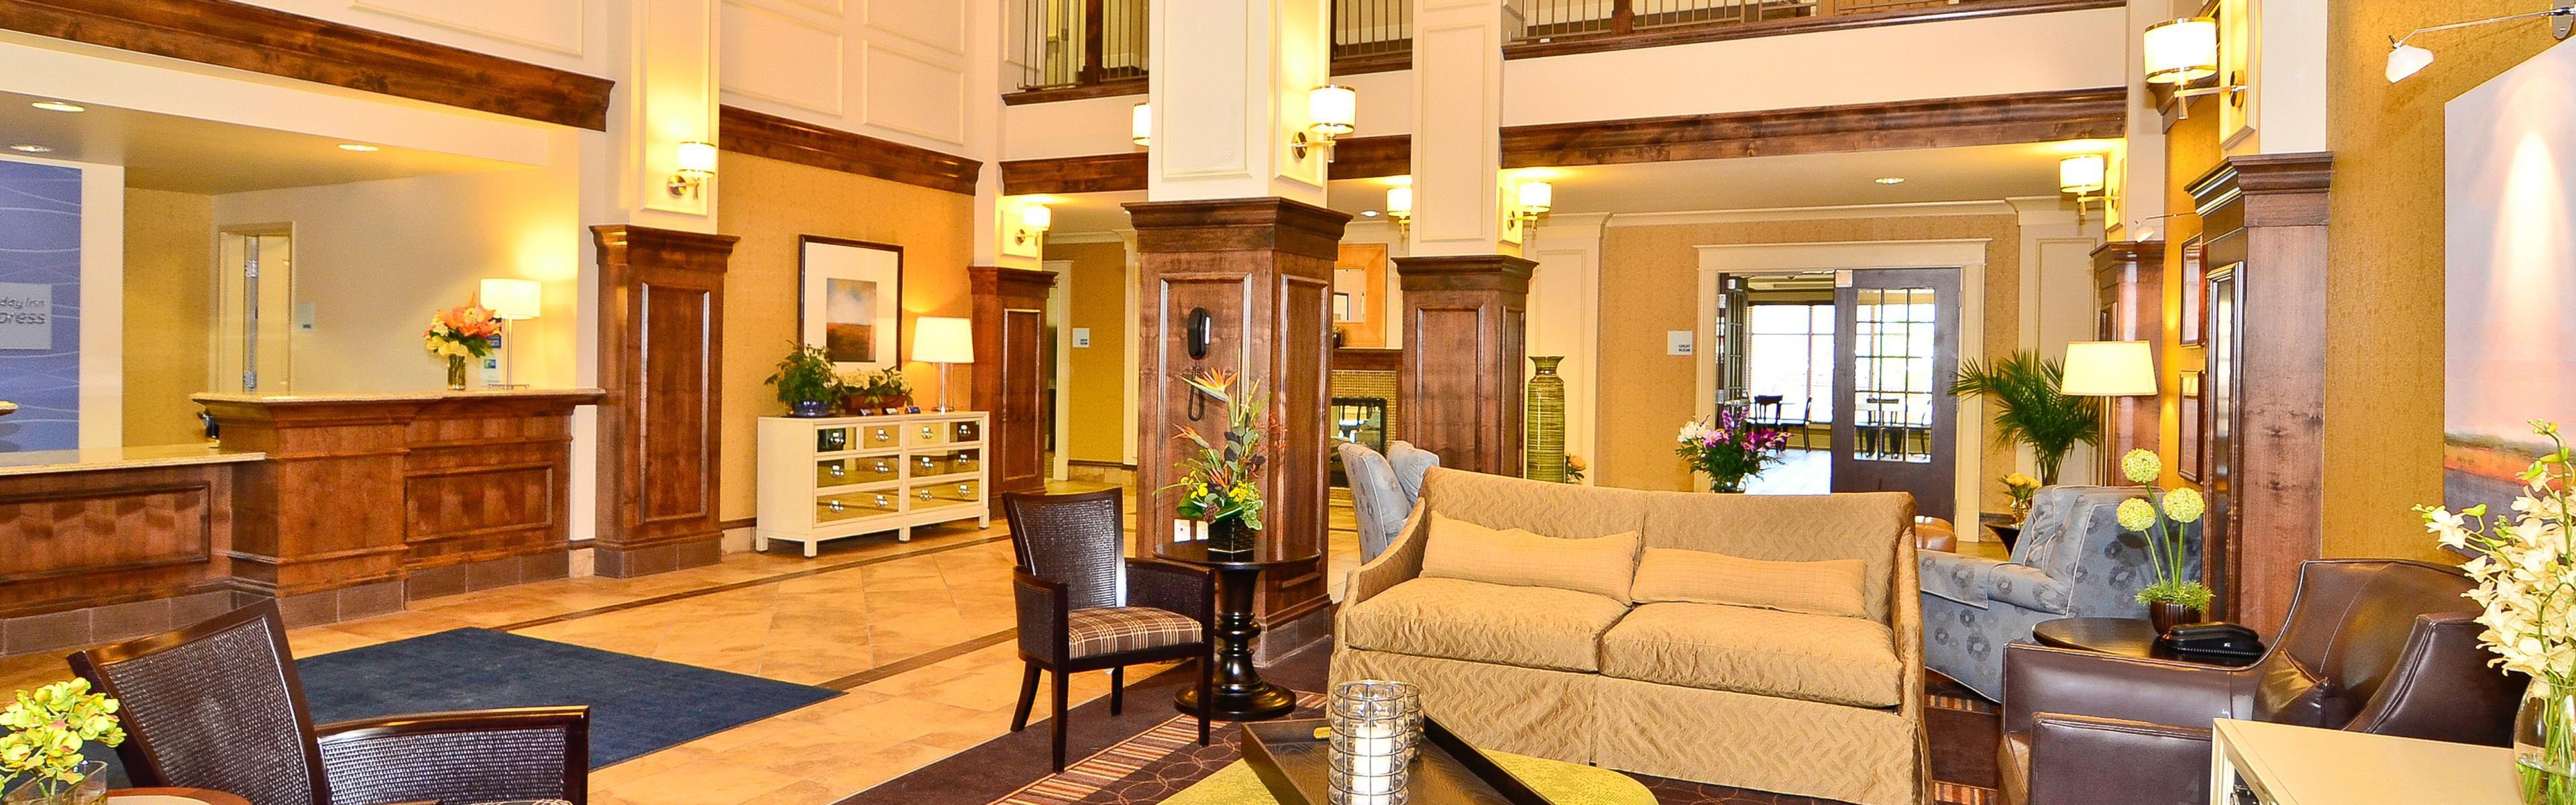 Holiday Inn Express & Suites Williston image 0